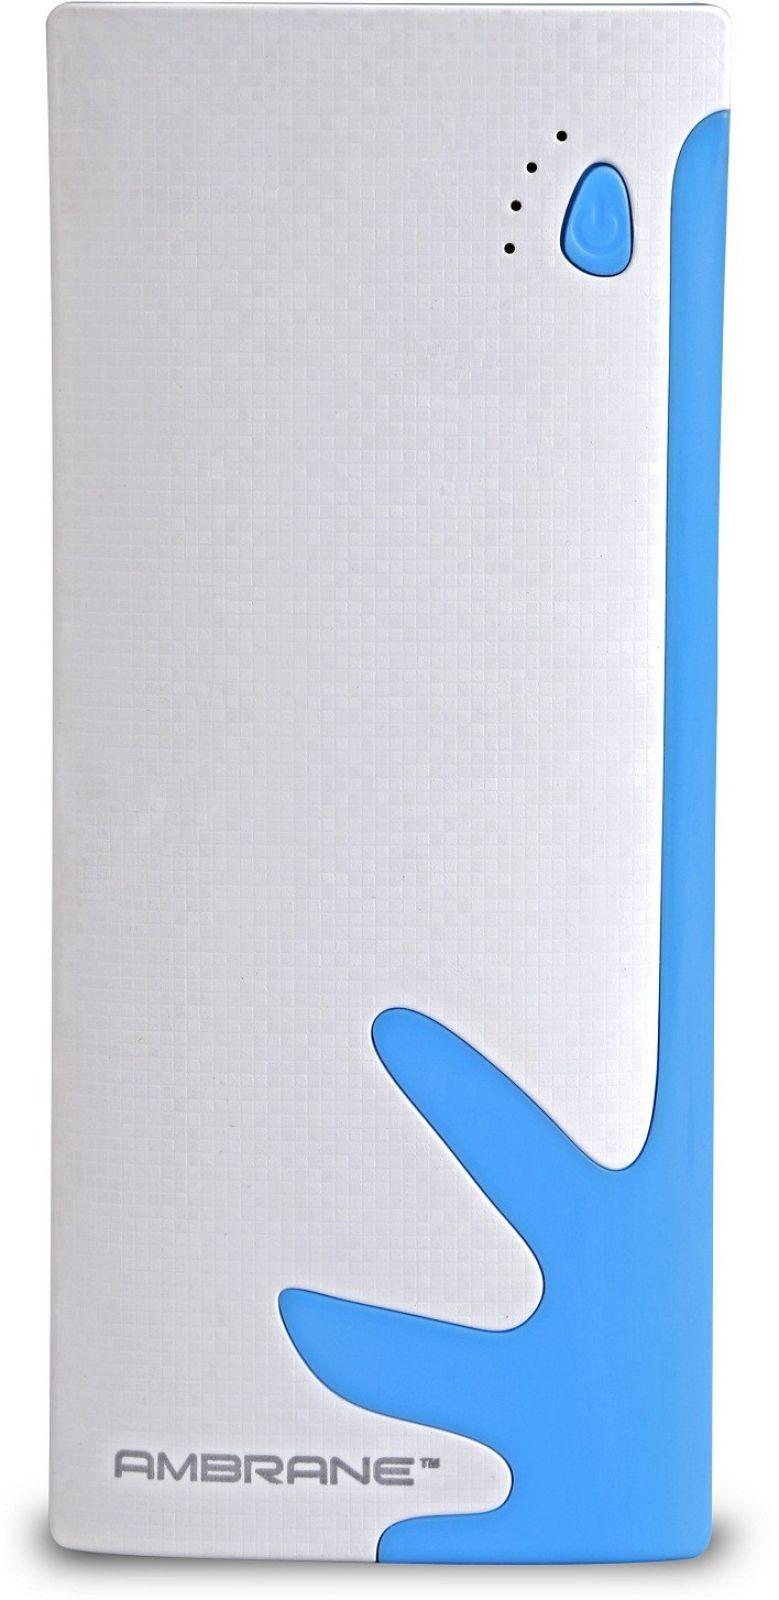 Ambrane 10000 mAh Power Bank (P-1122, NA)  (White, Blue, Lithium-ion)